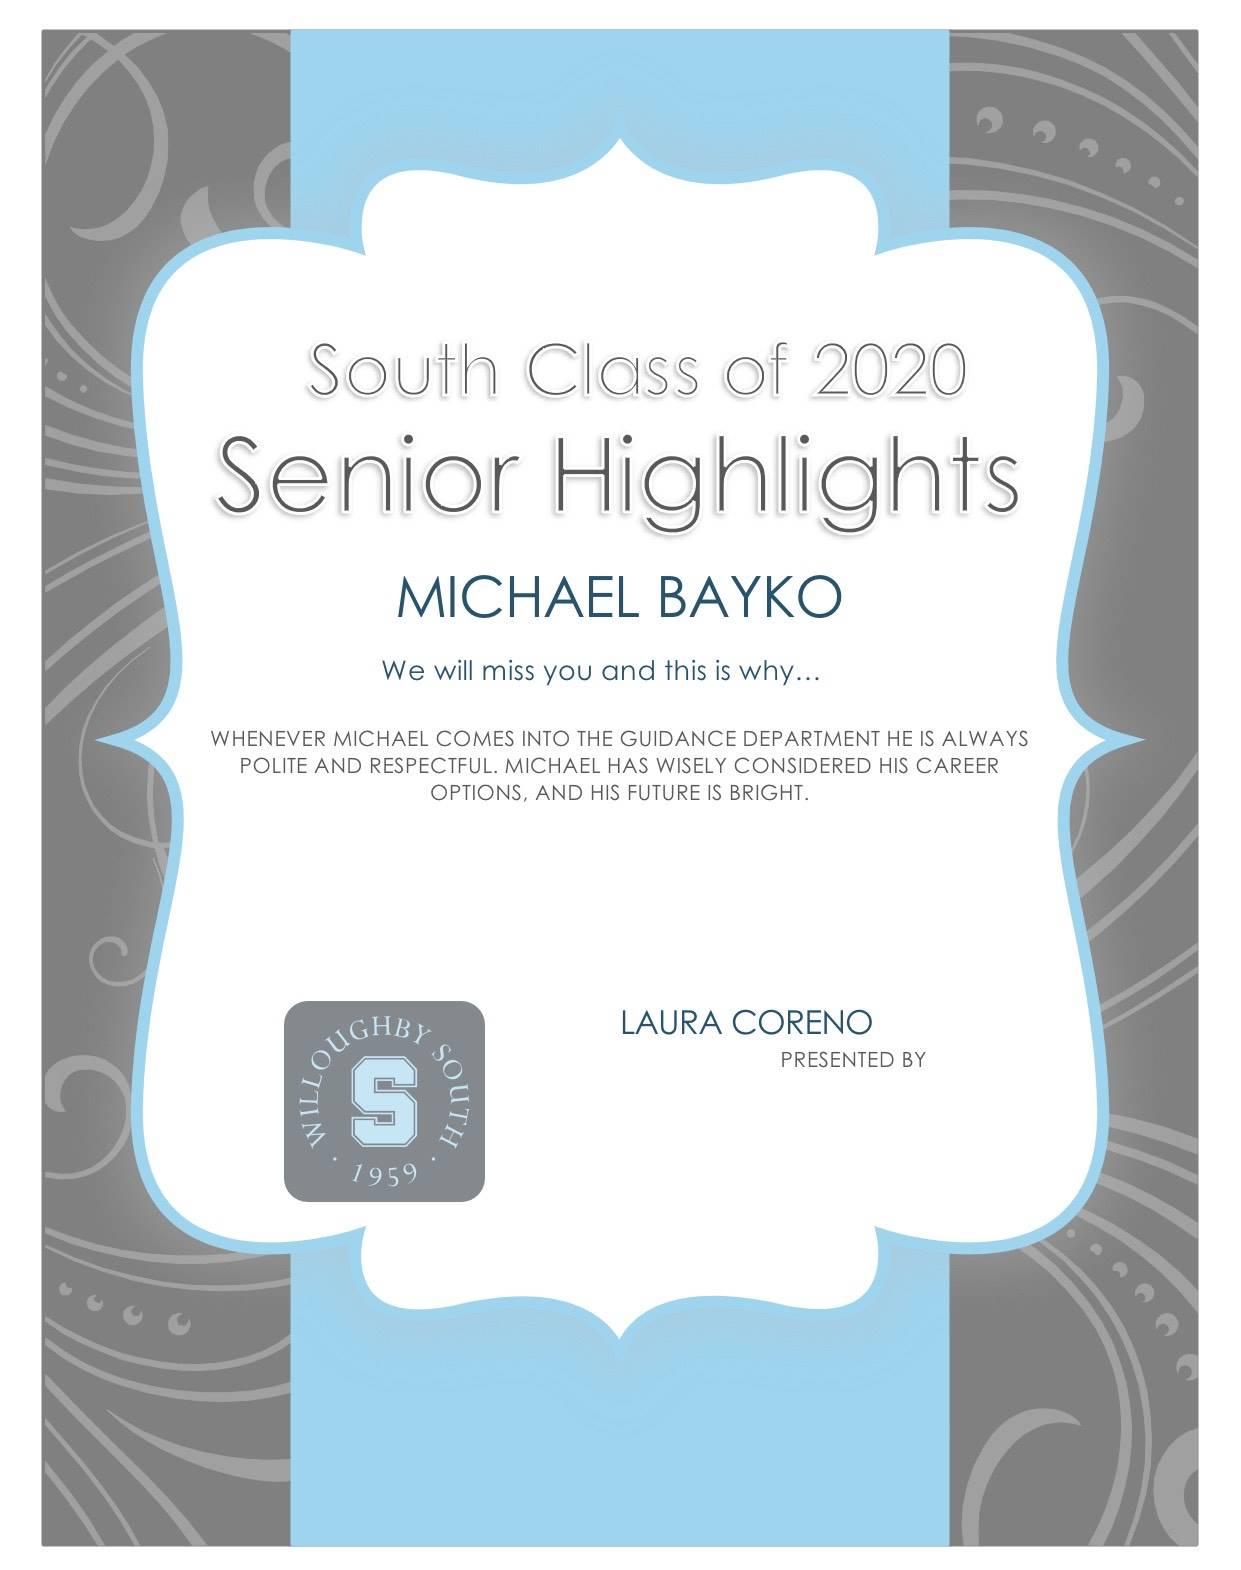 Michael Bayko